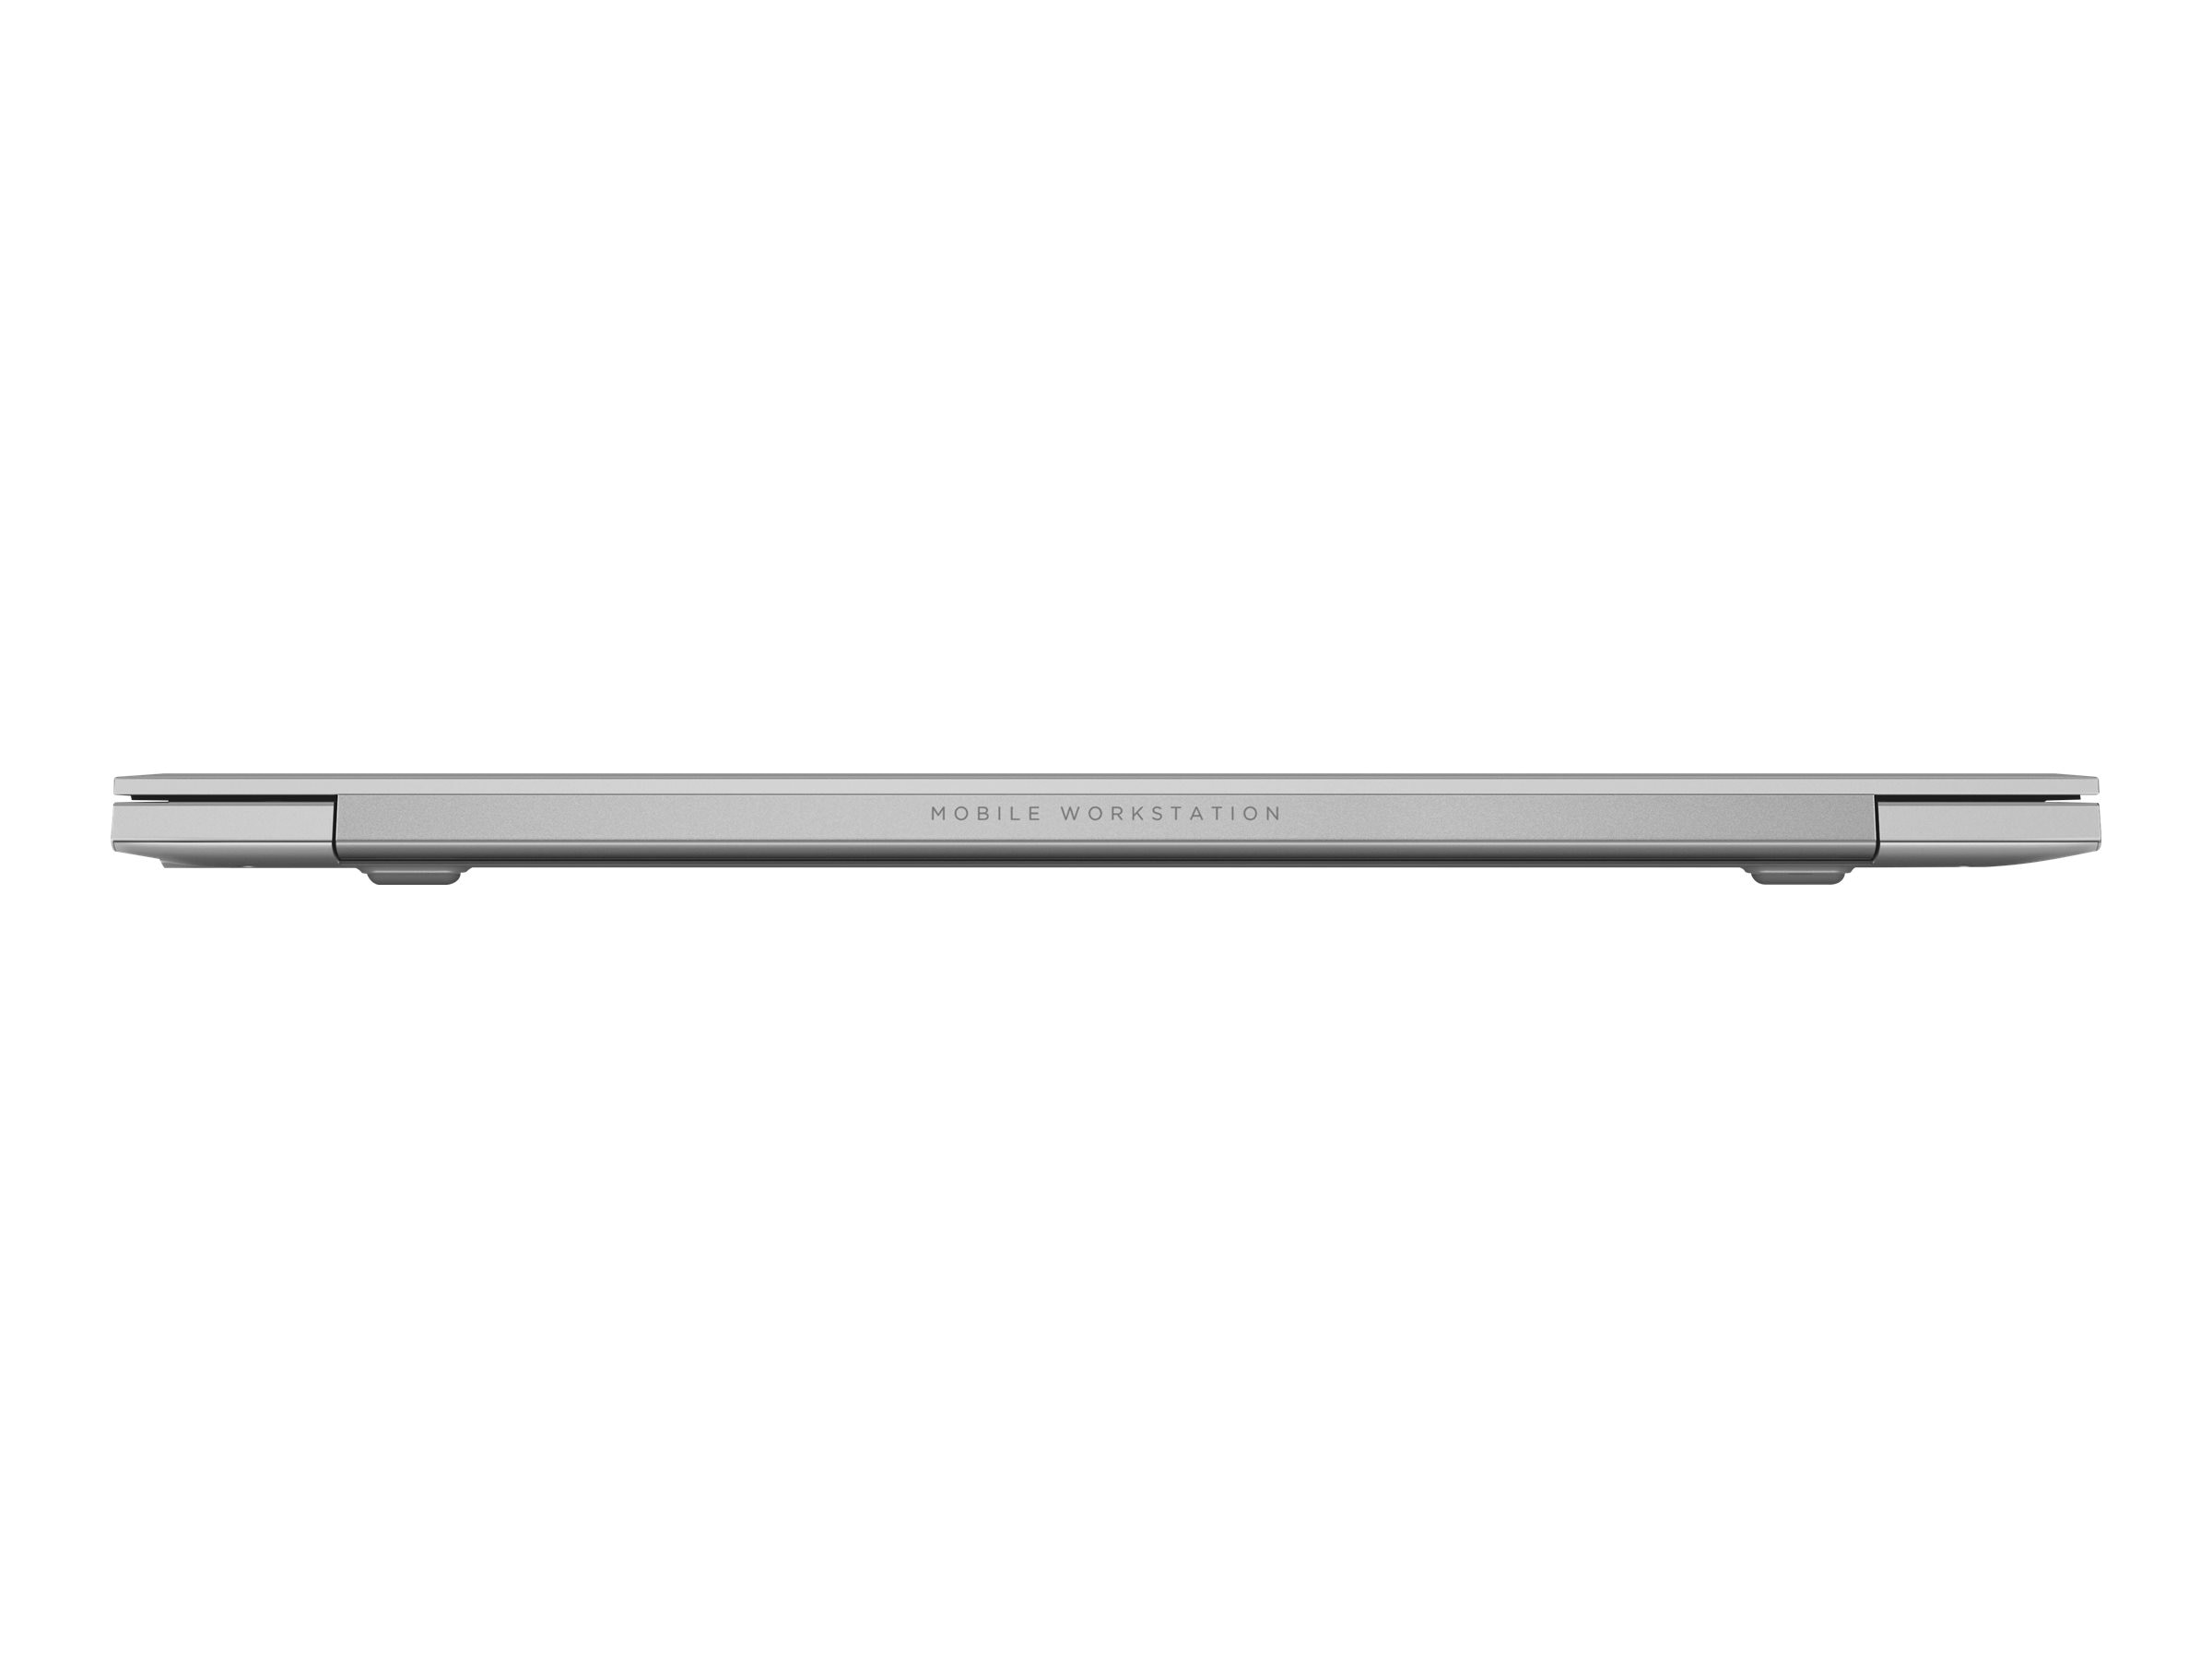 hp zbook 15u g5 mobile workstation price